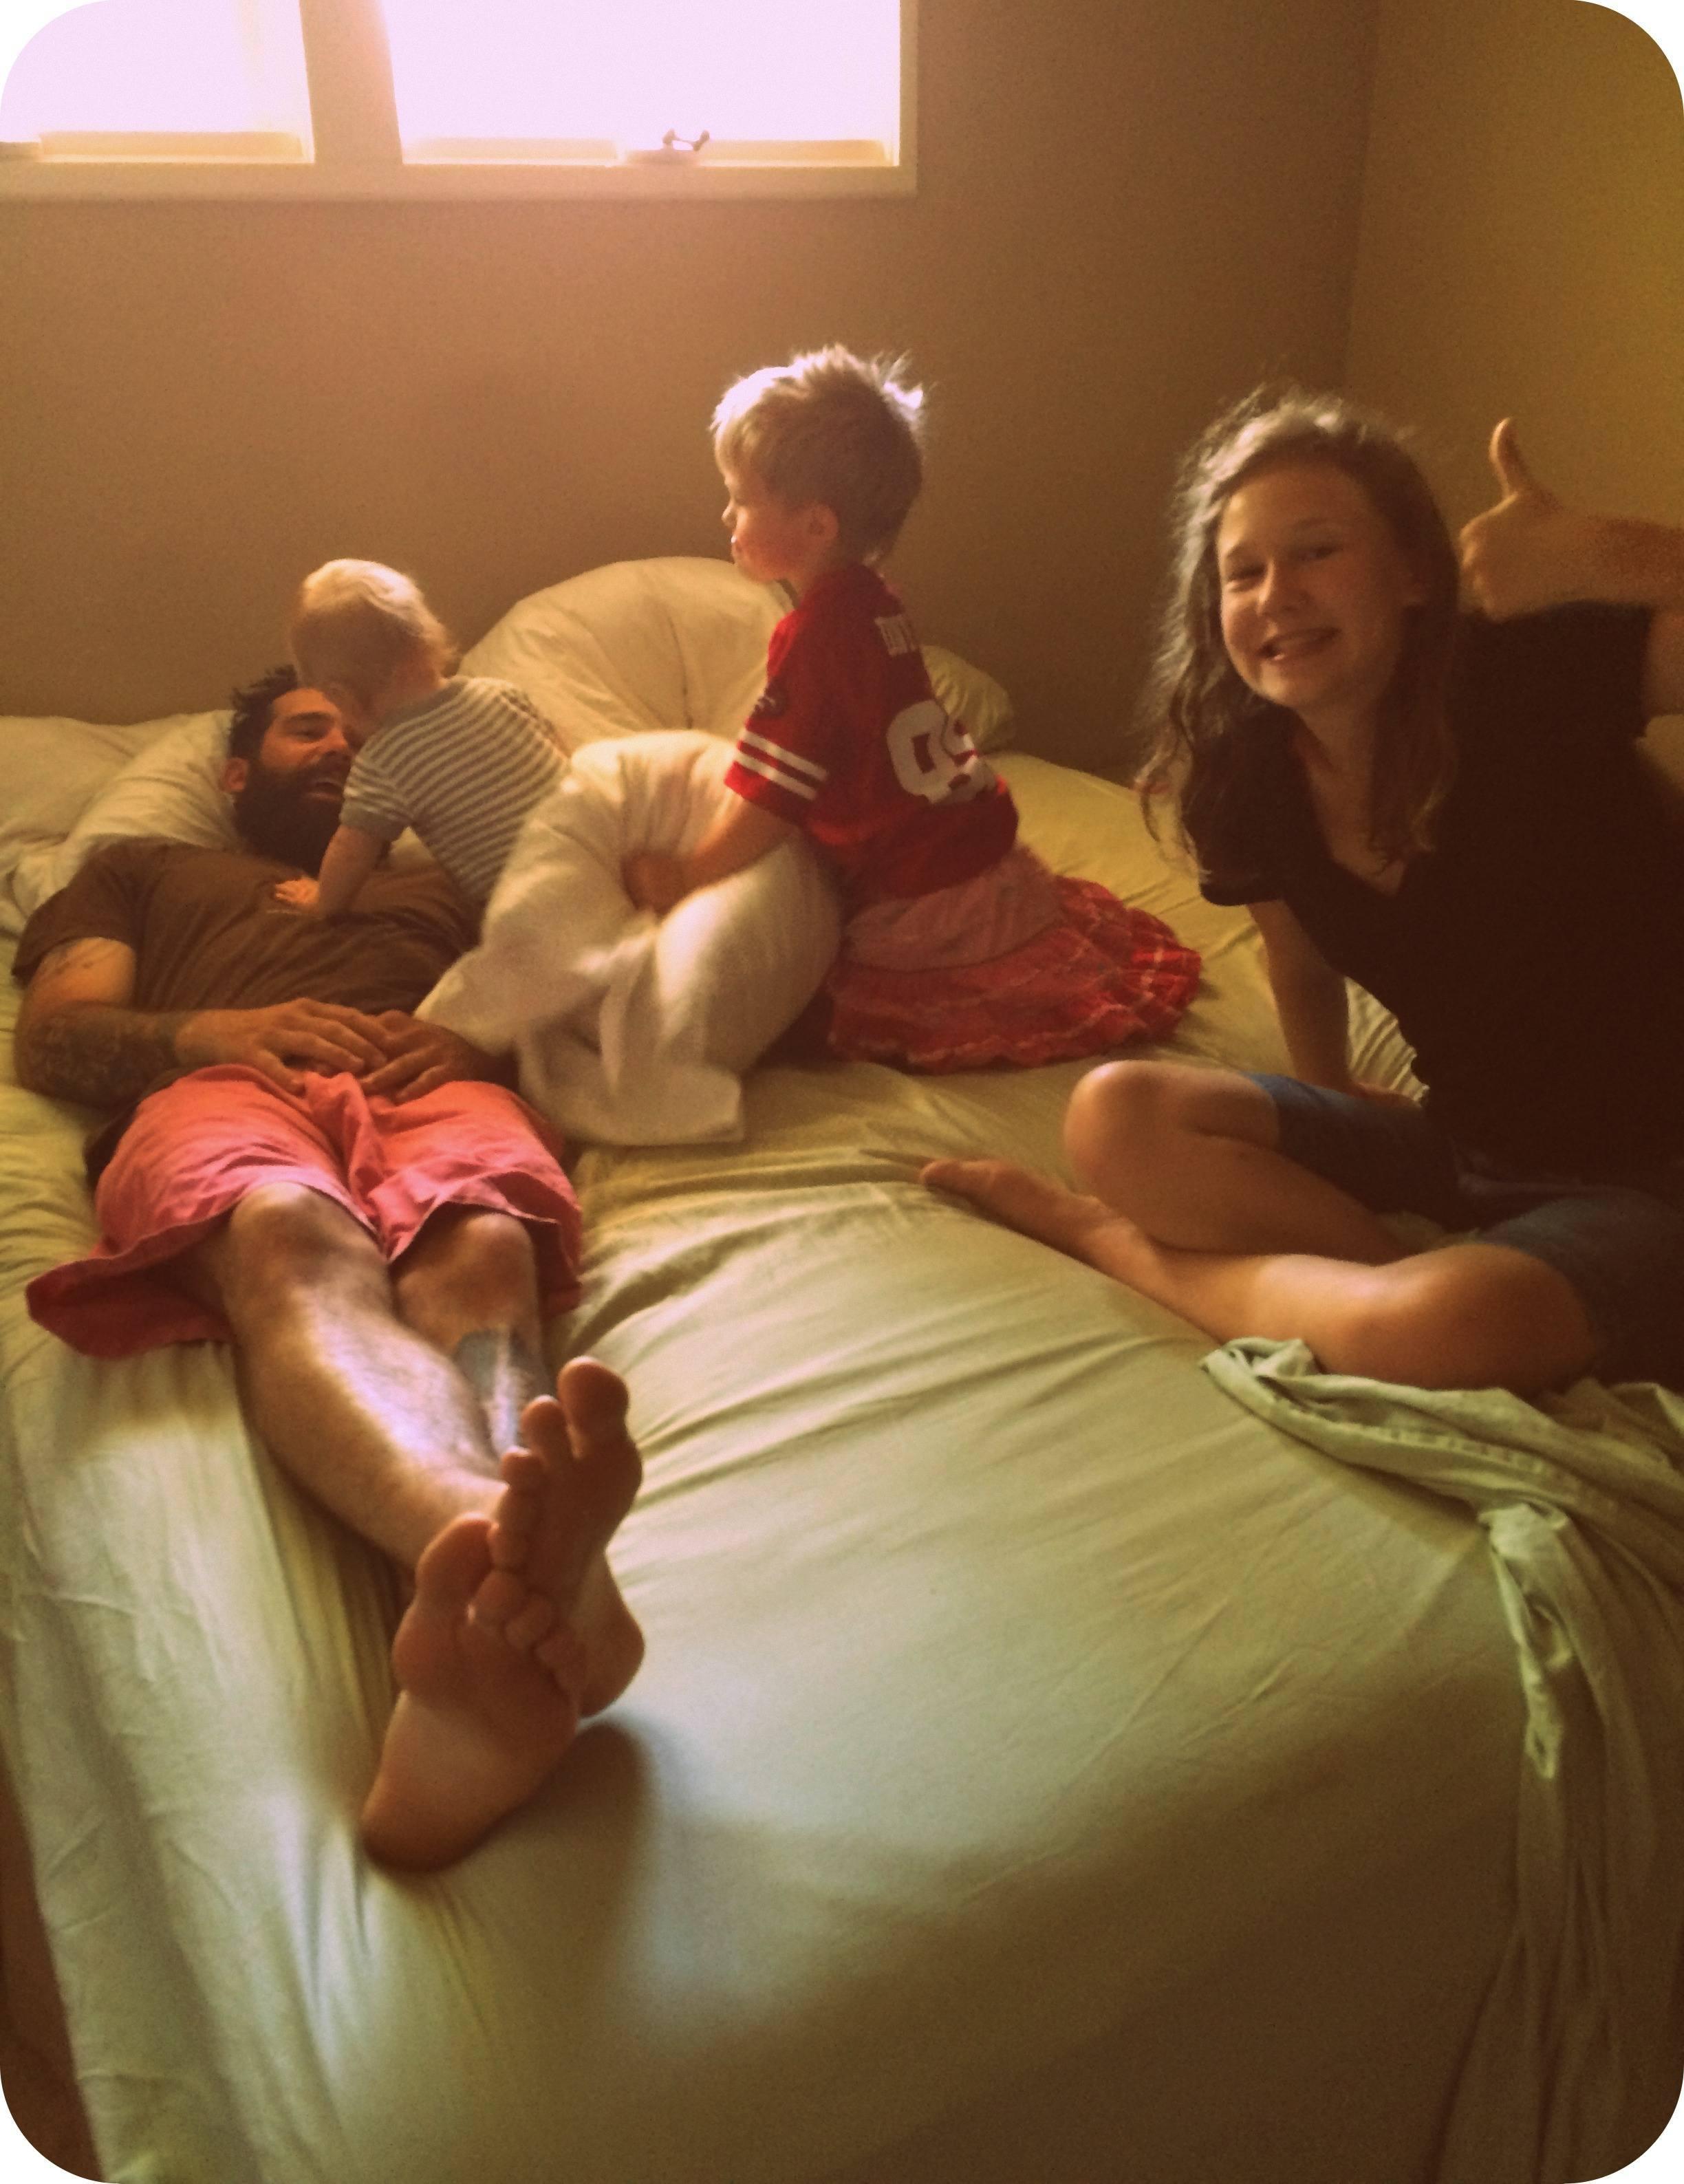 I am unwavering however in my devotion to making my bed each morning. ha. ha. ha.